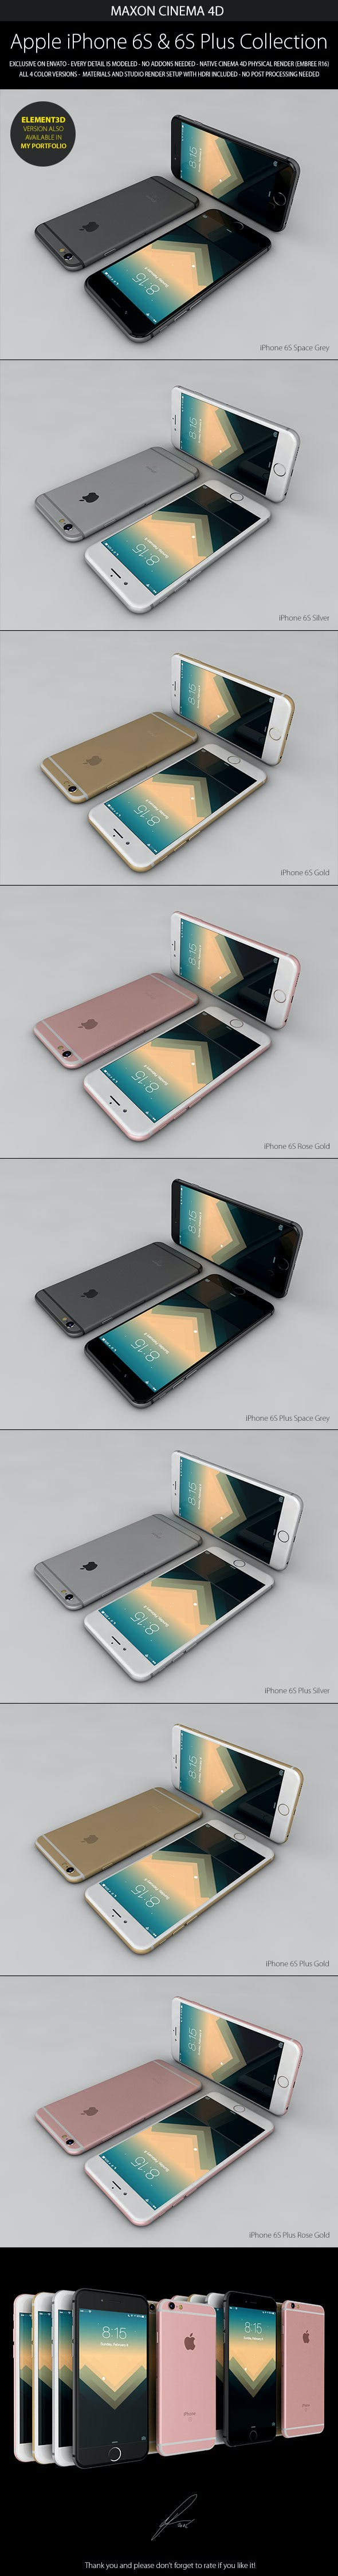 iPhone 6S & 6S Plus - 3DOcean Item for Sale